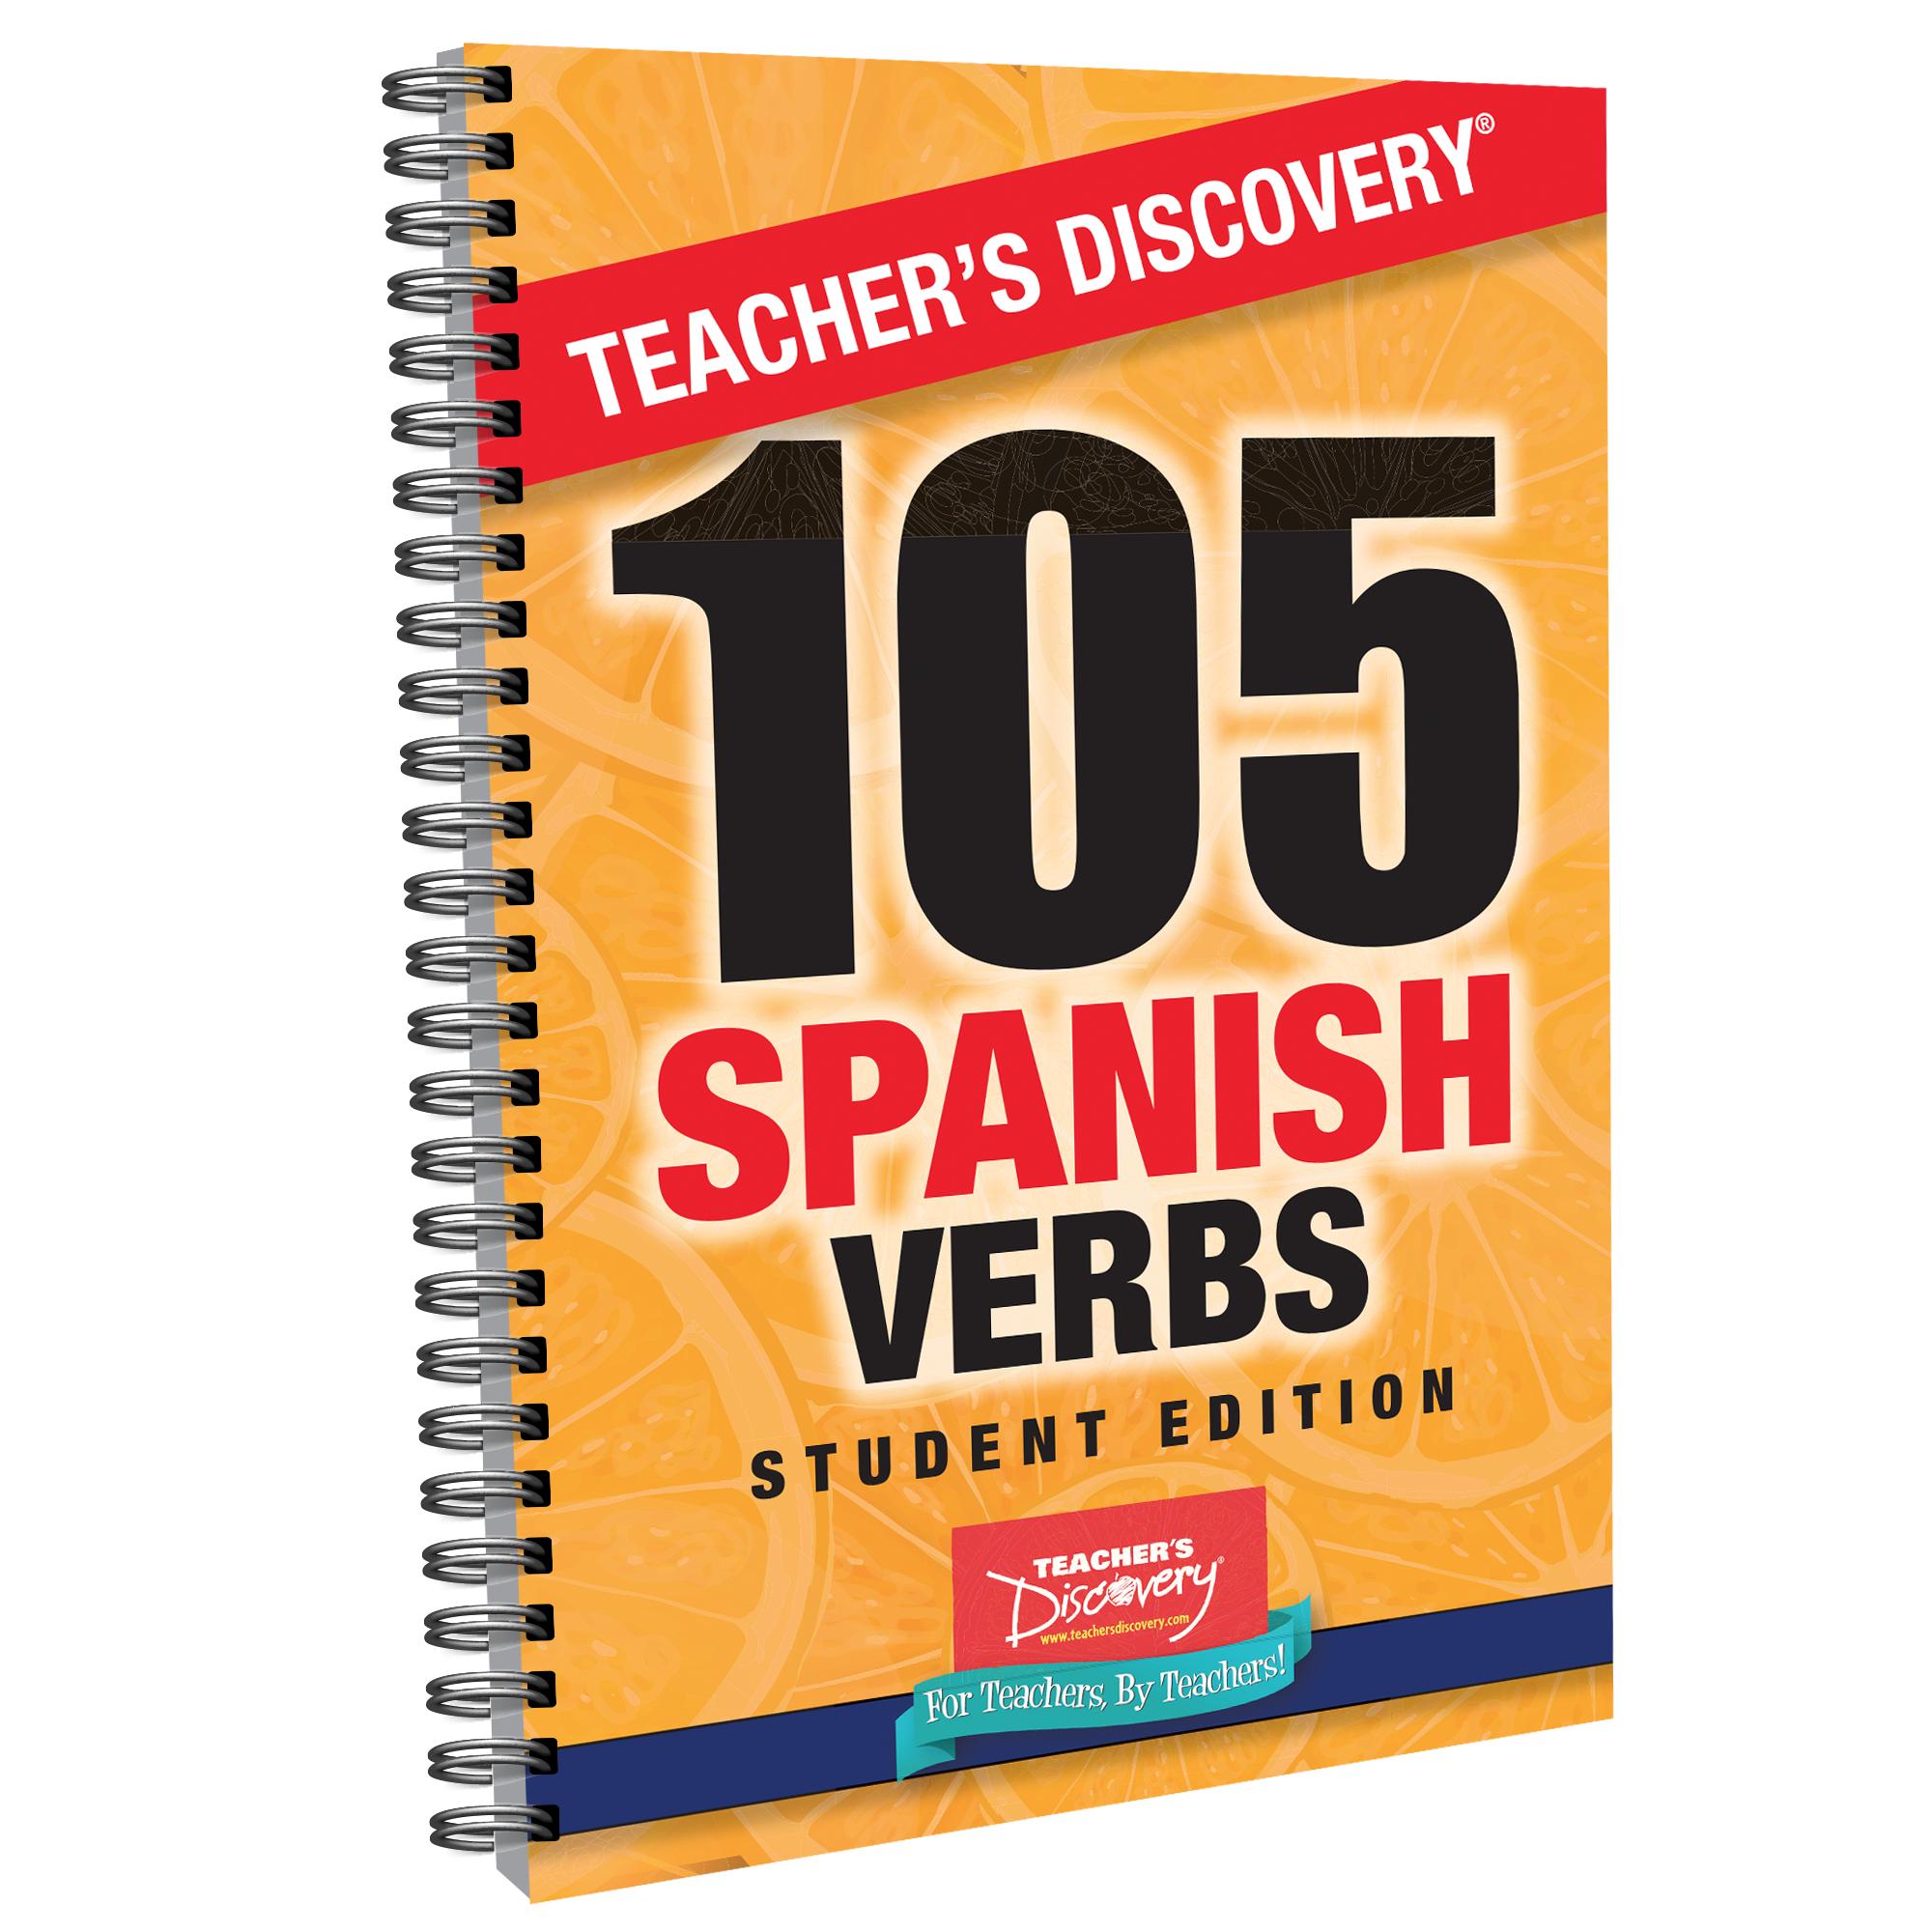 105 Spanish Verbs Handbook